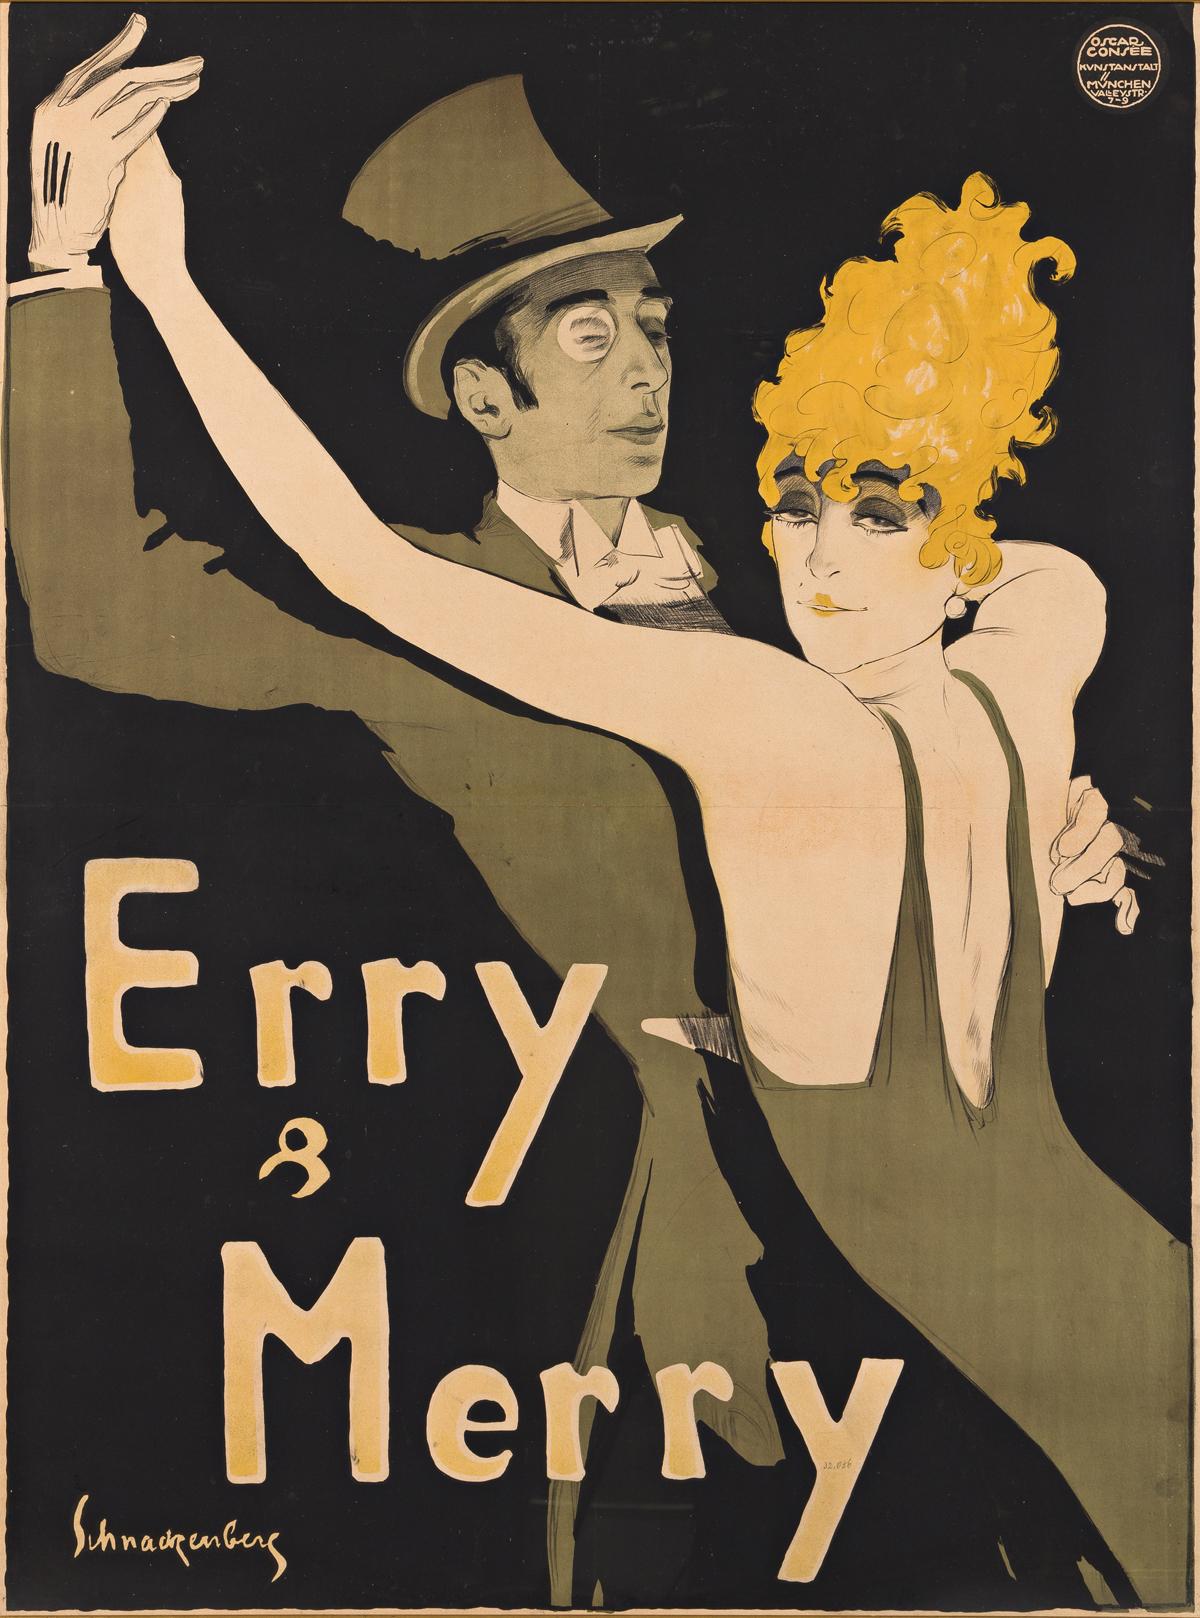 WALTER SCHNACKENBERG (1880-1961).  ERRY & MERRY. 1912. 49x37 inches, 124½x94 cm. Oscar Consée, Munich.